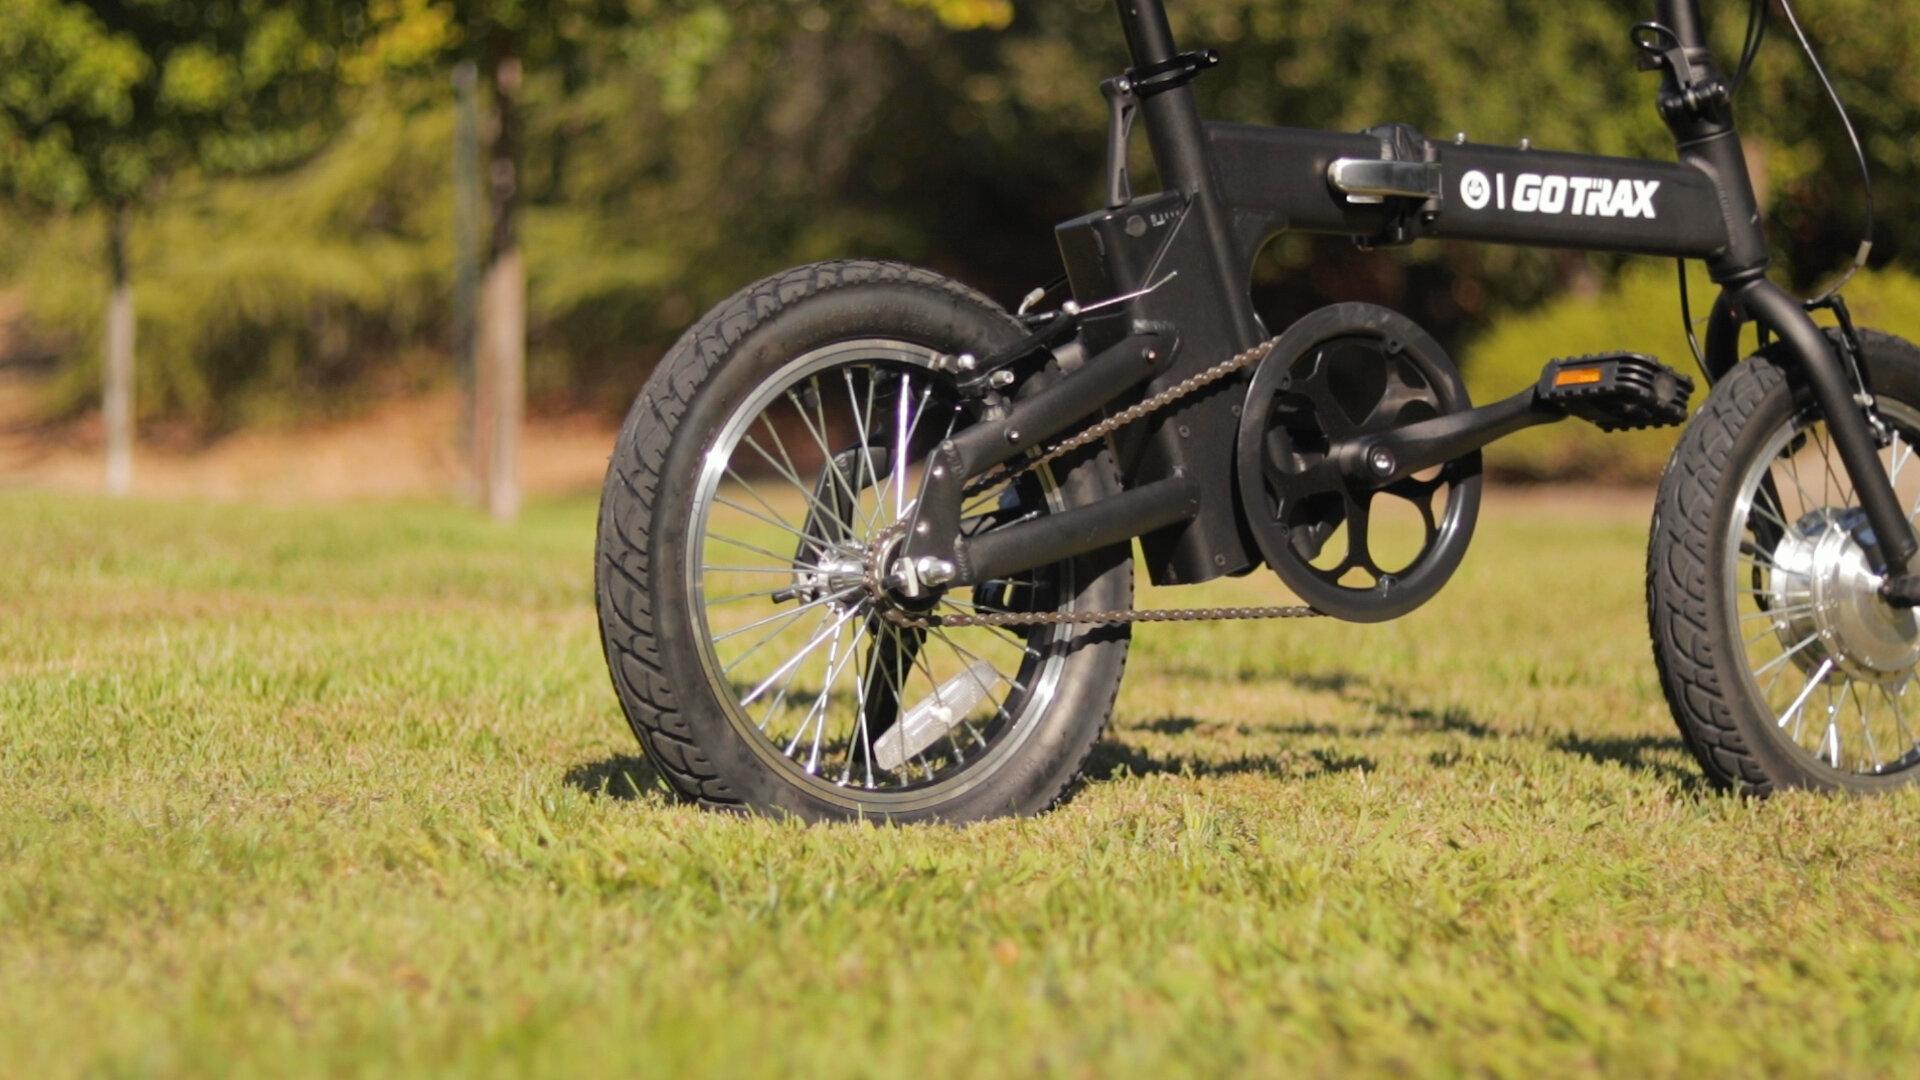 gotrax-shift-s1-electric-bike-review-2019-battery-2.jpg